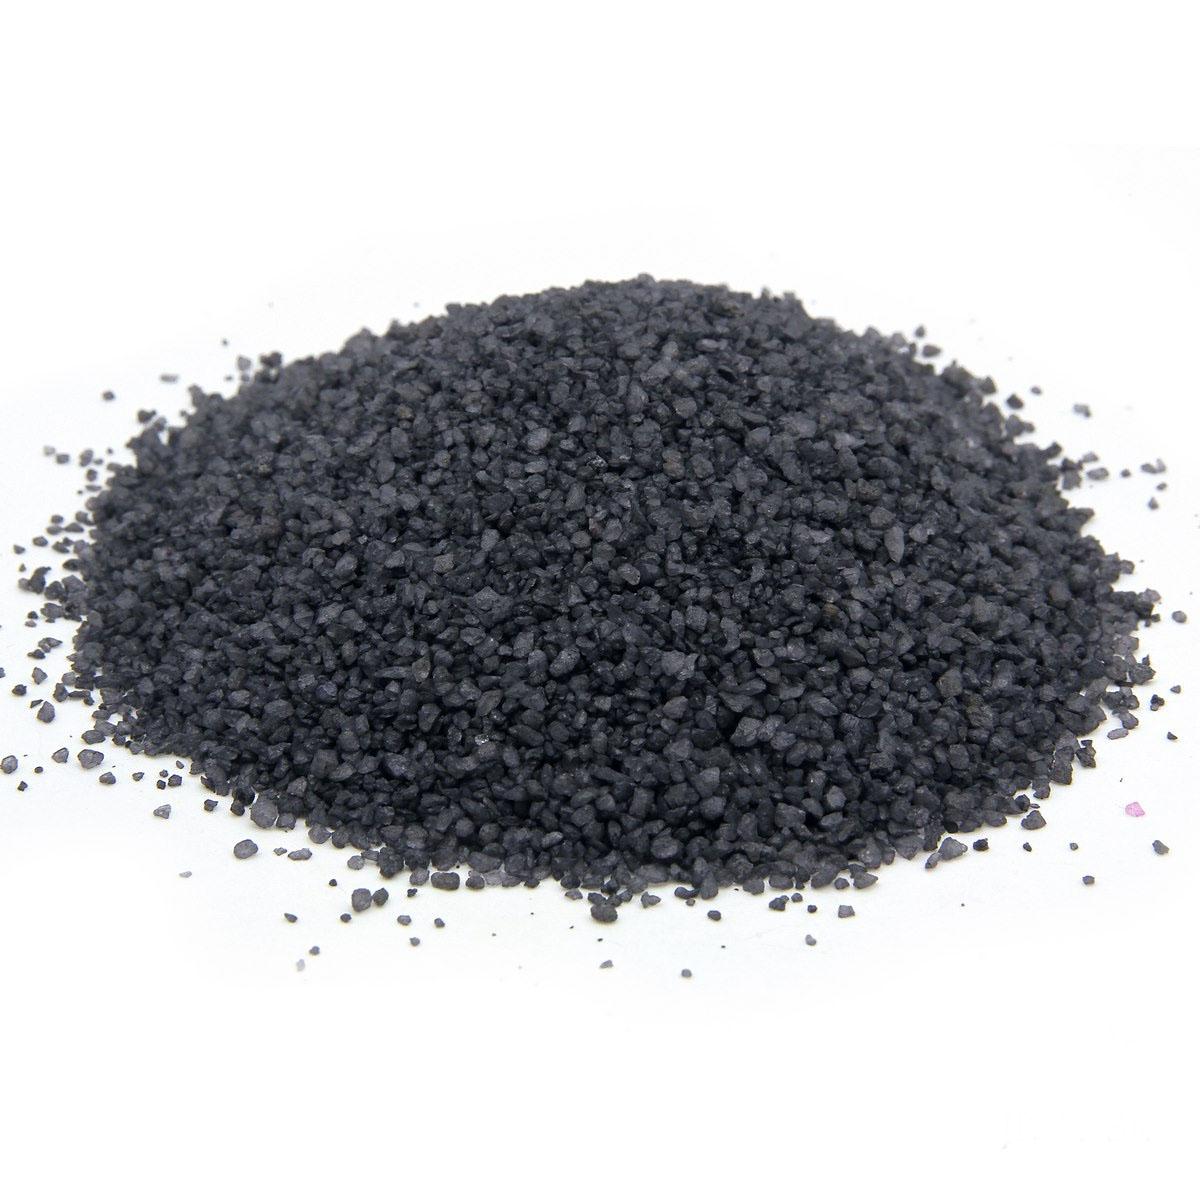 Jags resin Stone Micro 250gm Black JRSM-BK